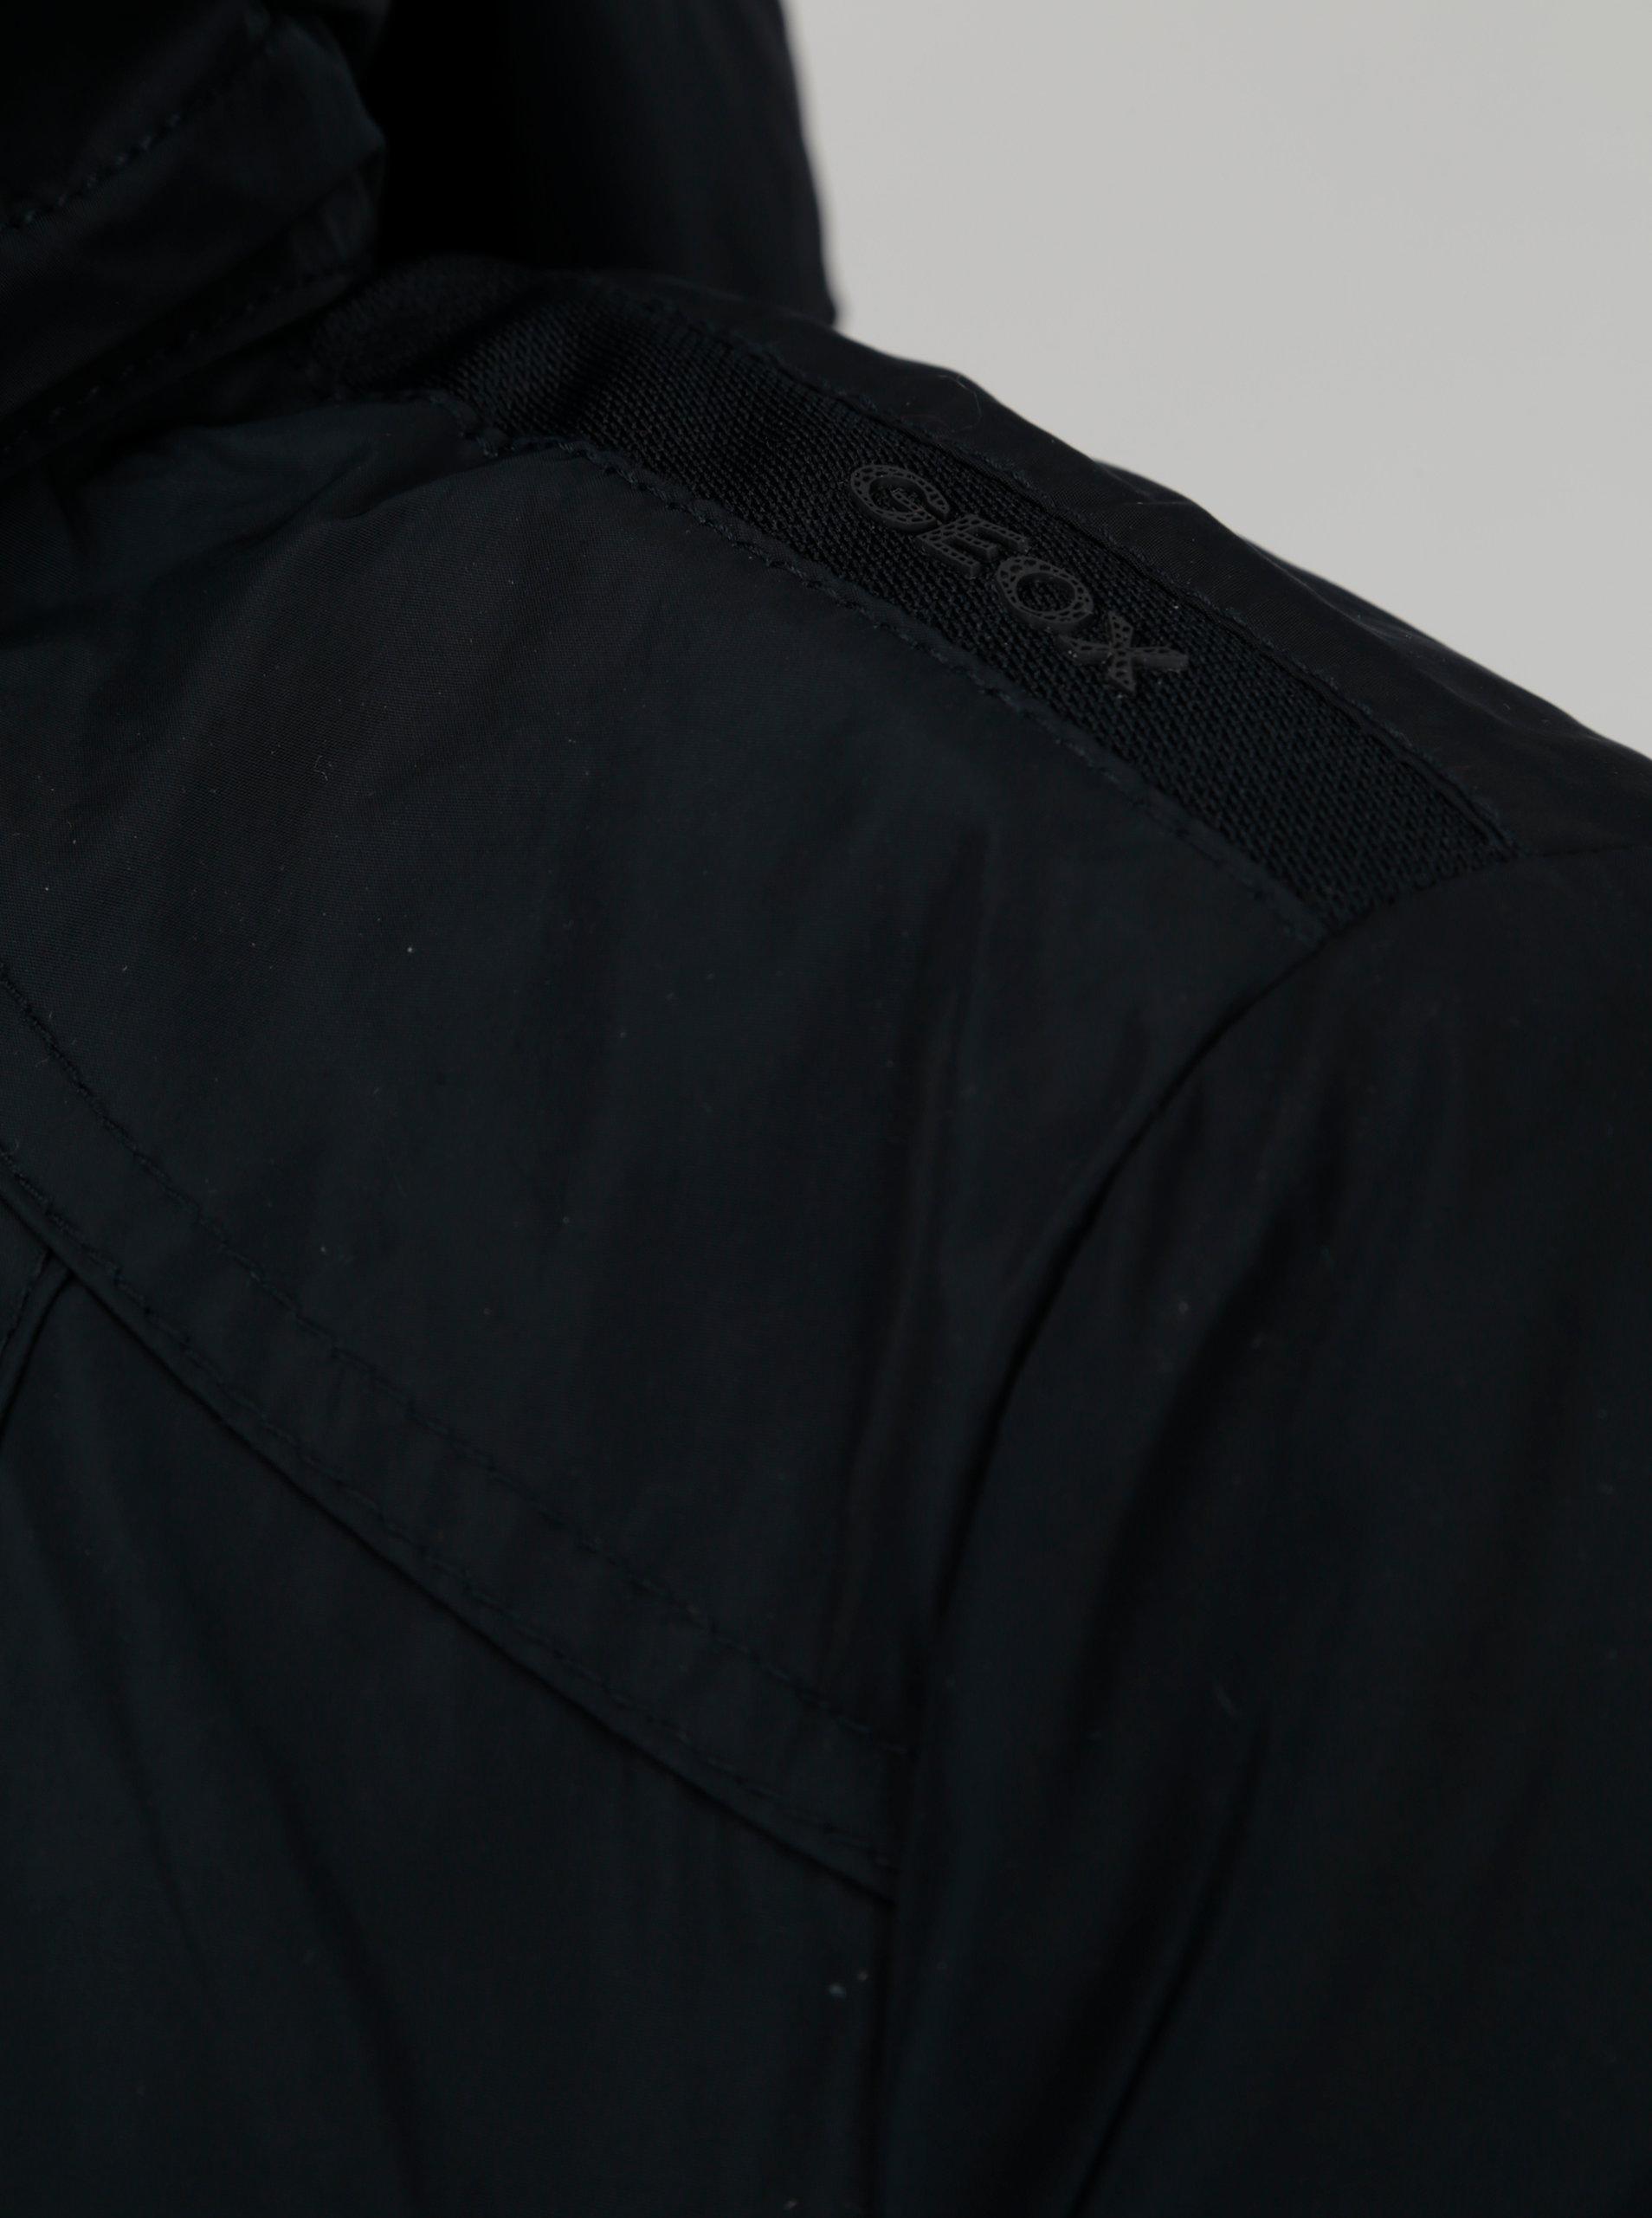 Tmavomodrá dámska bunda s kapucňou a opaskom Geox ... cc3c79baed8